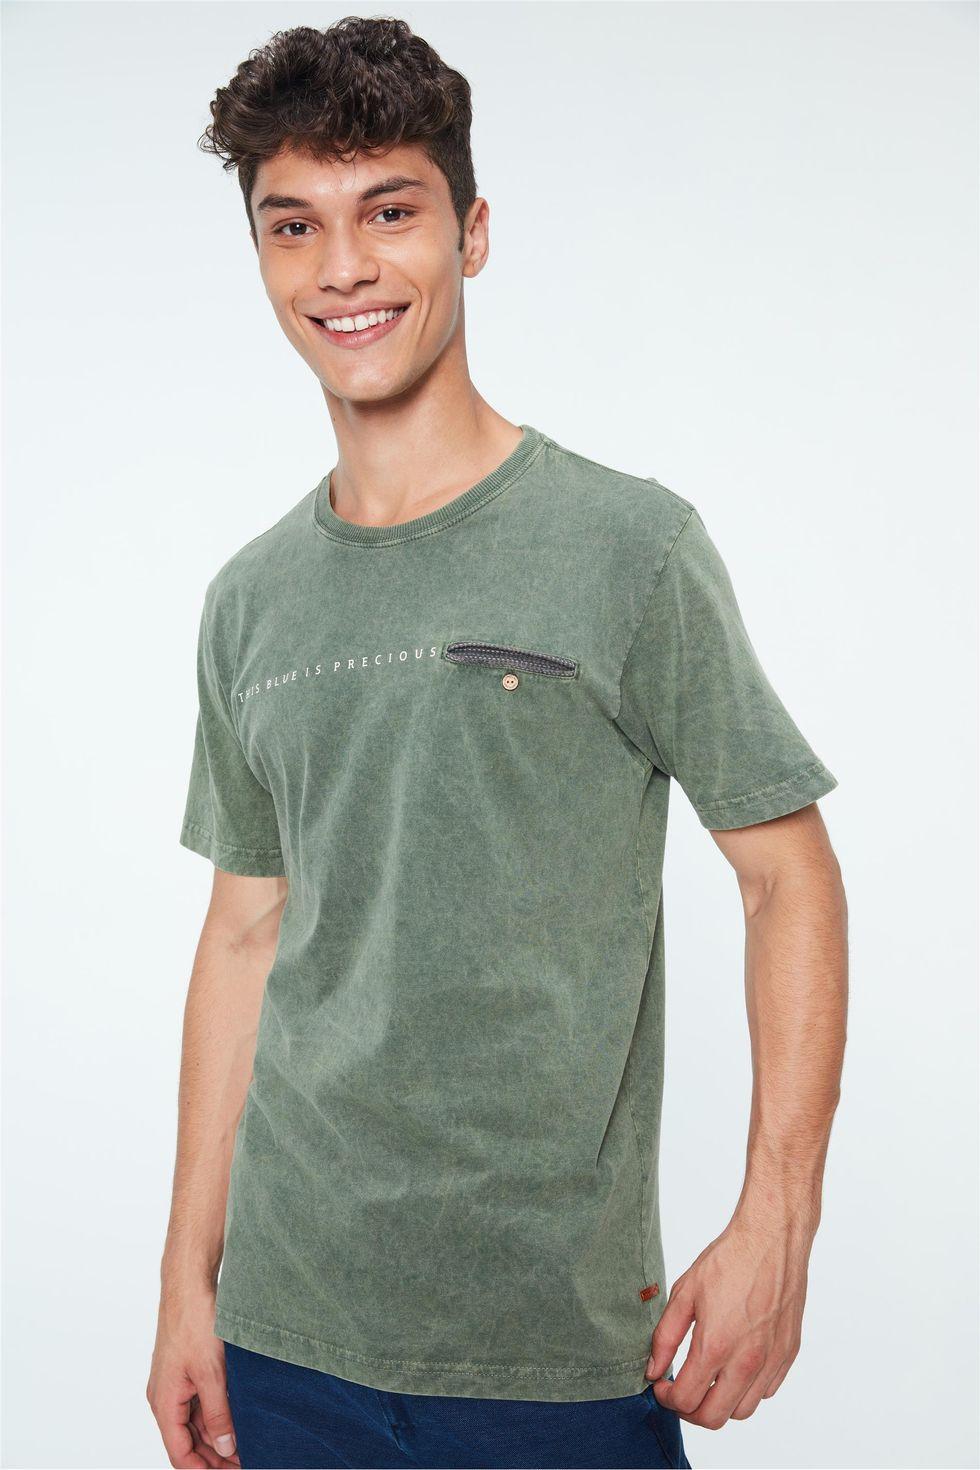 Camiseta-Tingida-com-Bolso-Masculina-Frente--